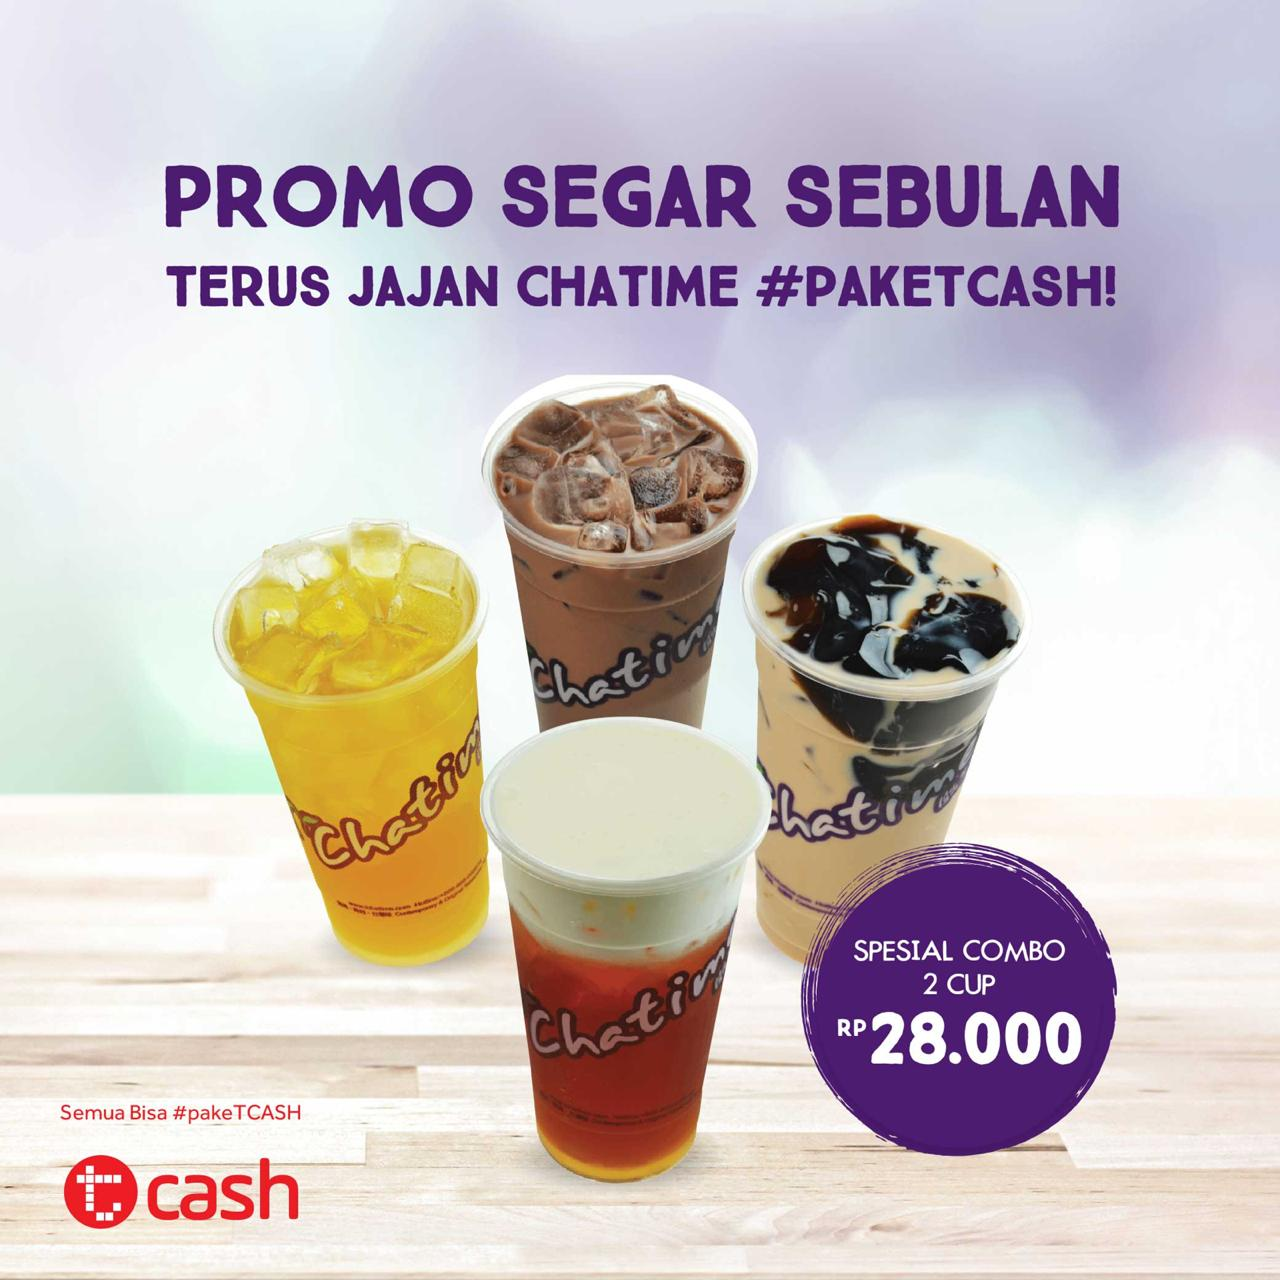 Chatime - Promo Segar Sebulan Pakai Tcash 2 Cup Cuma 26 Ribu (s.d 19 Okt 2018)